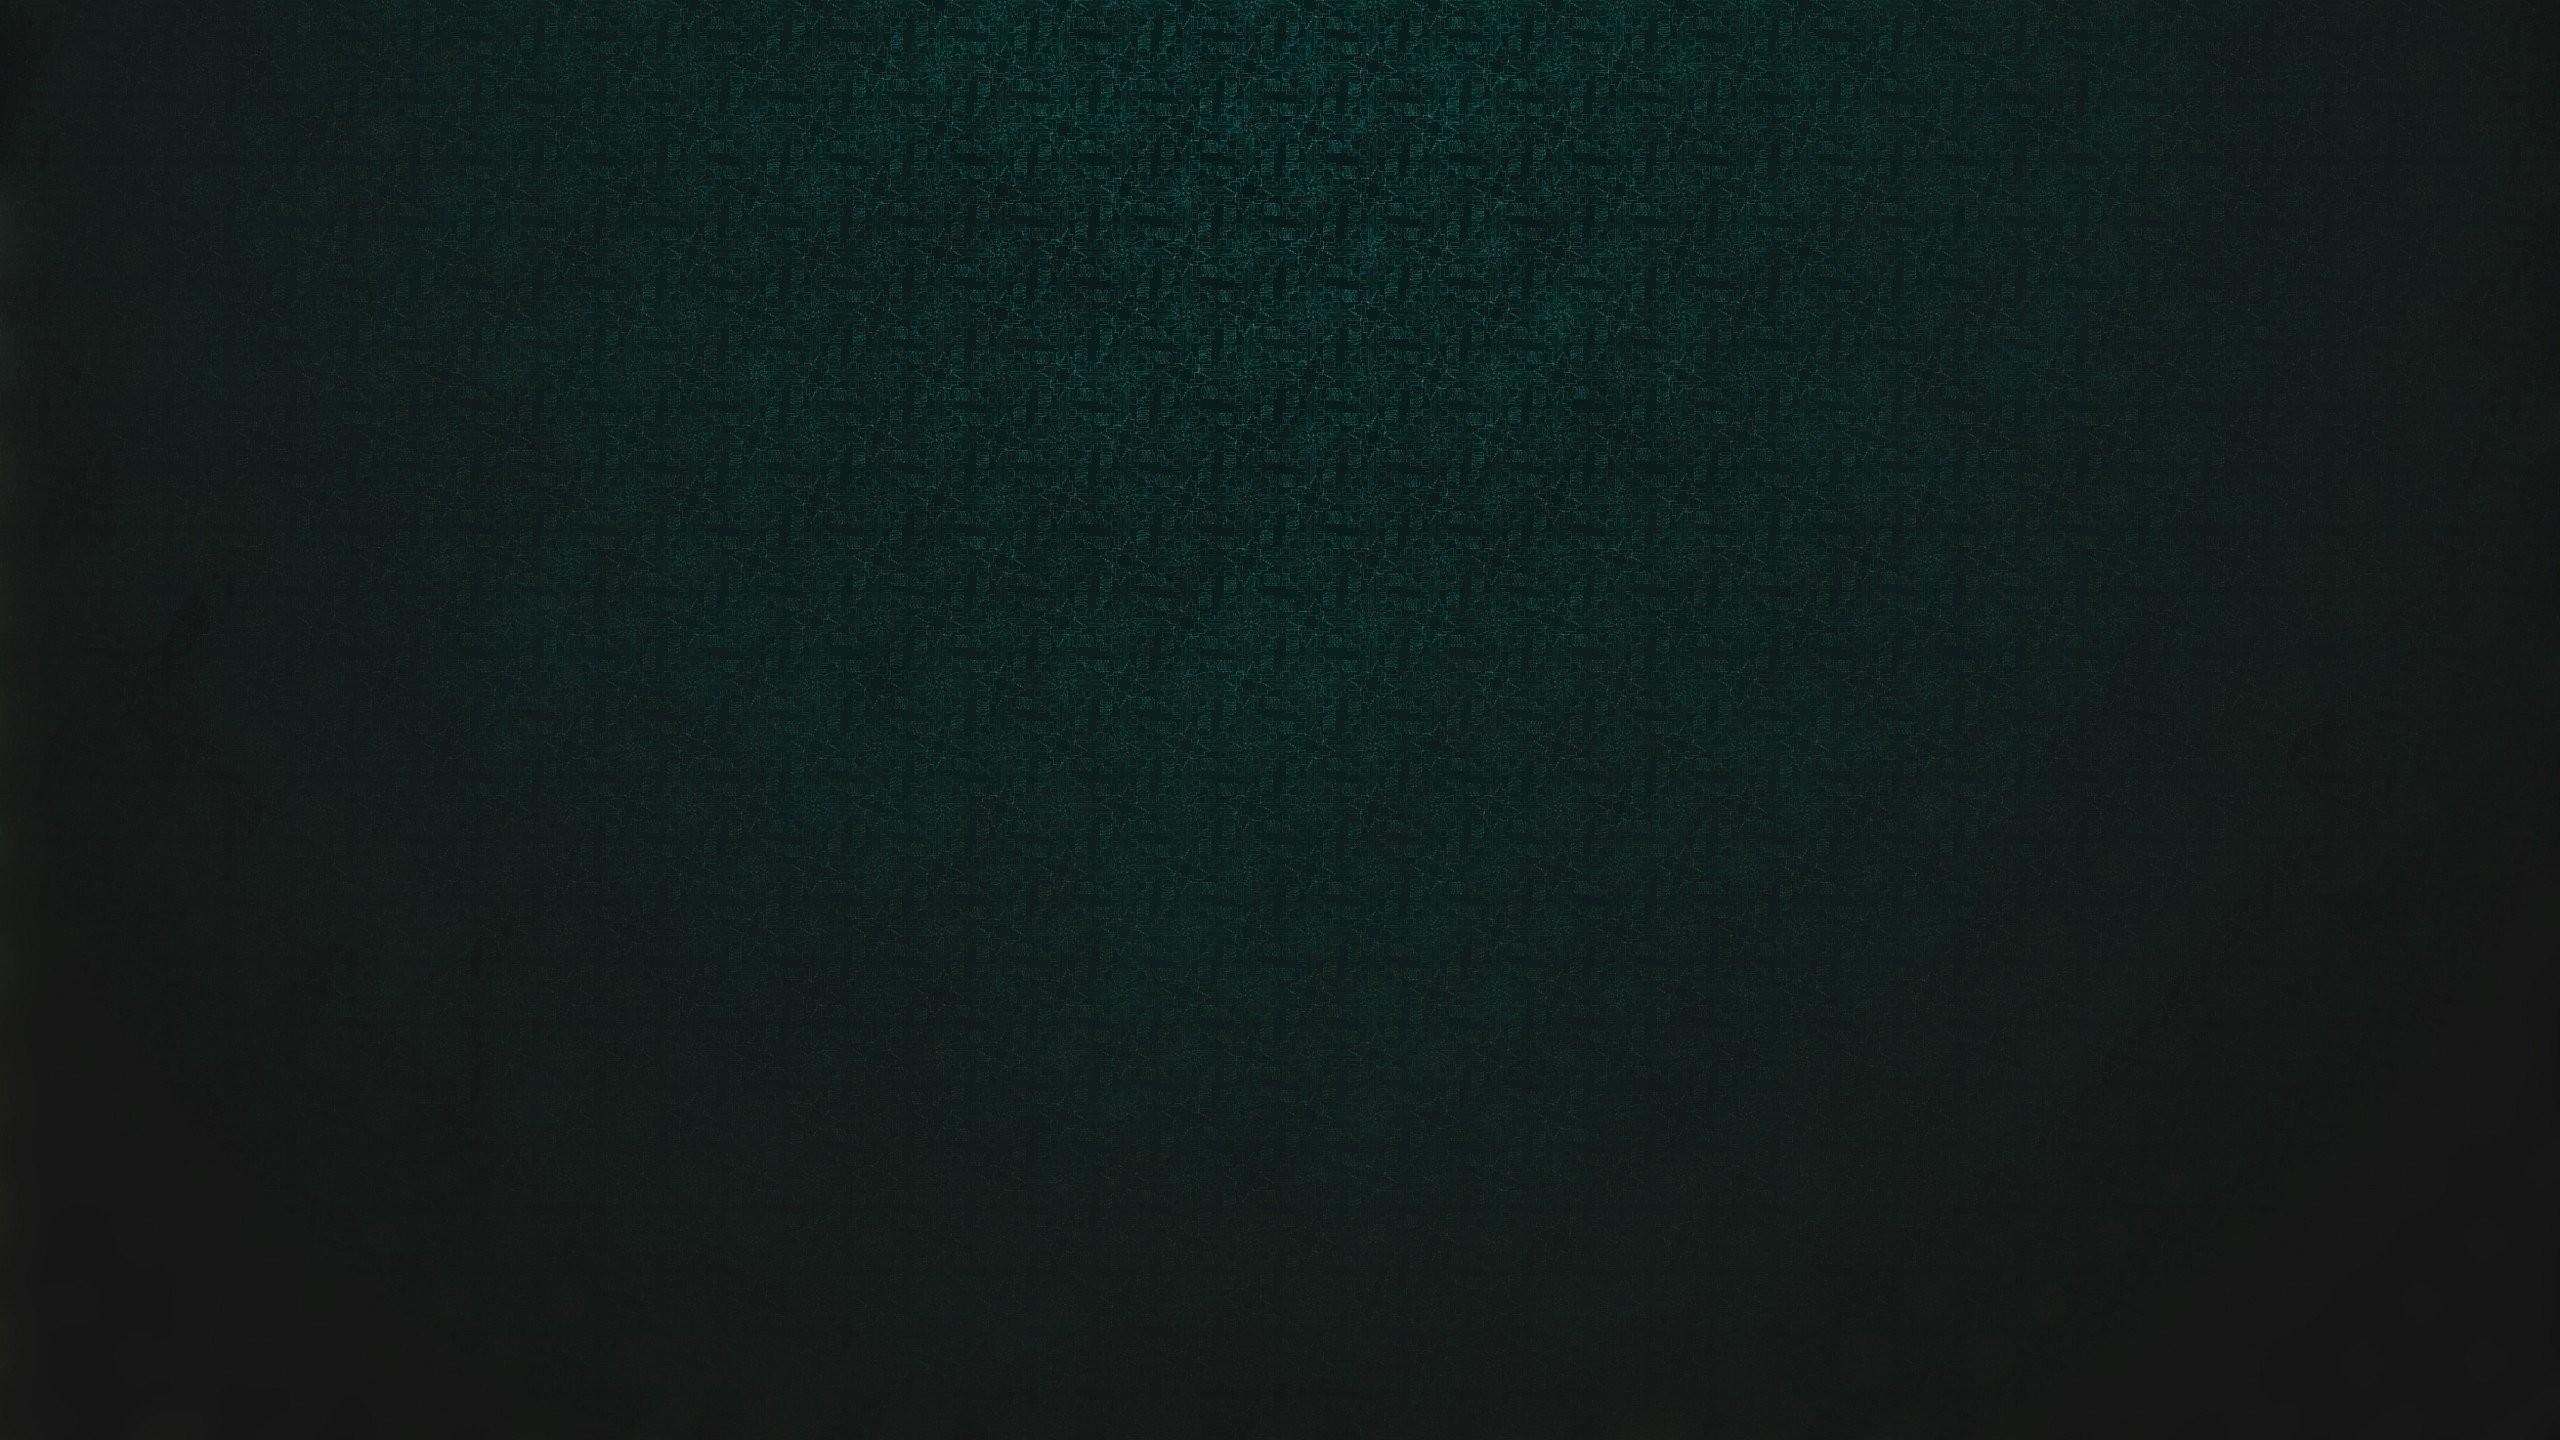 Travis Scott Iphone Wallpaper Chemistry Background 183 ① Download Free Stunning High